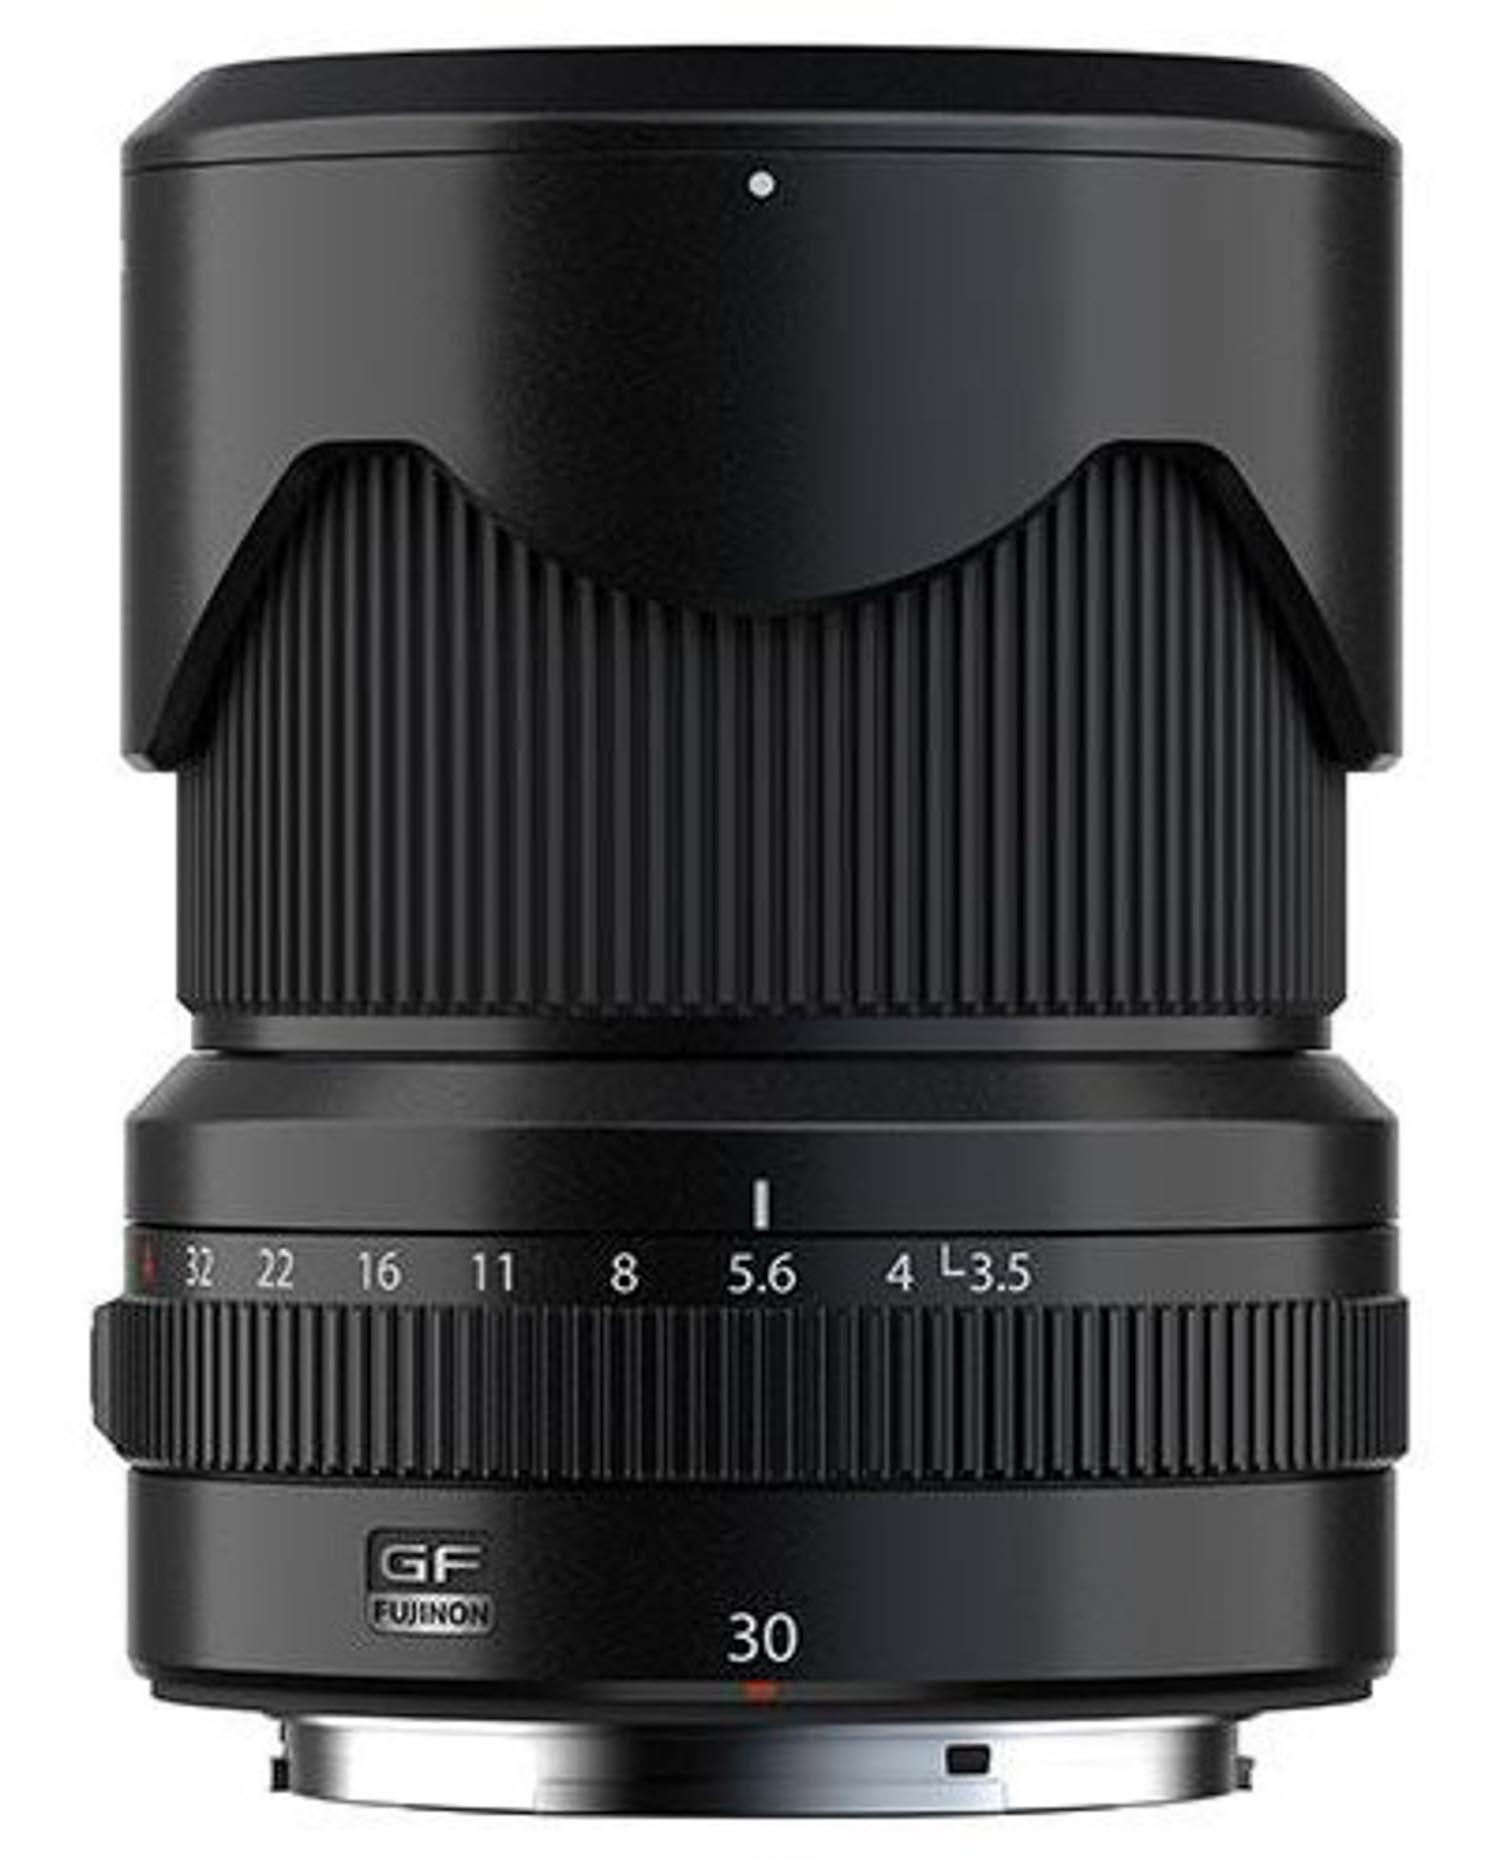 Fujinon GF 30mm f/3.5 leak